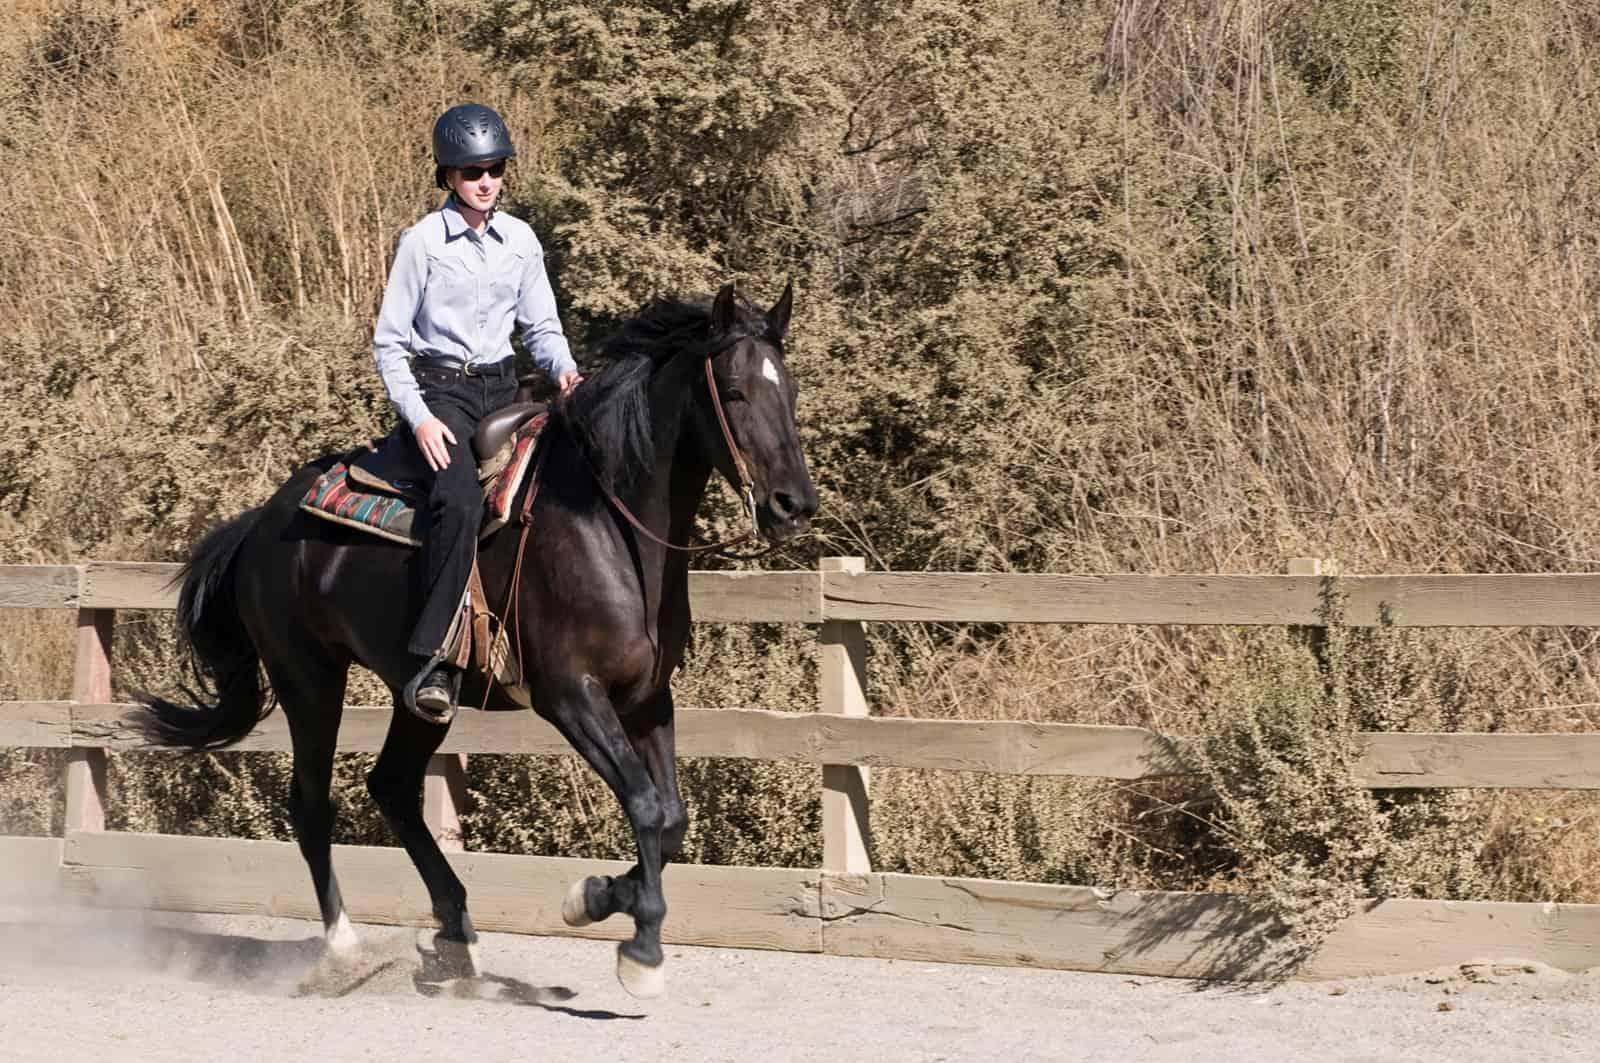 cross-training horses